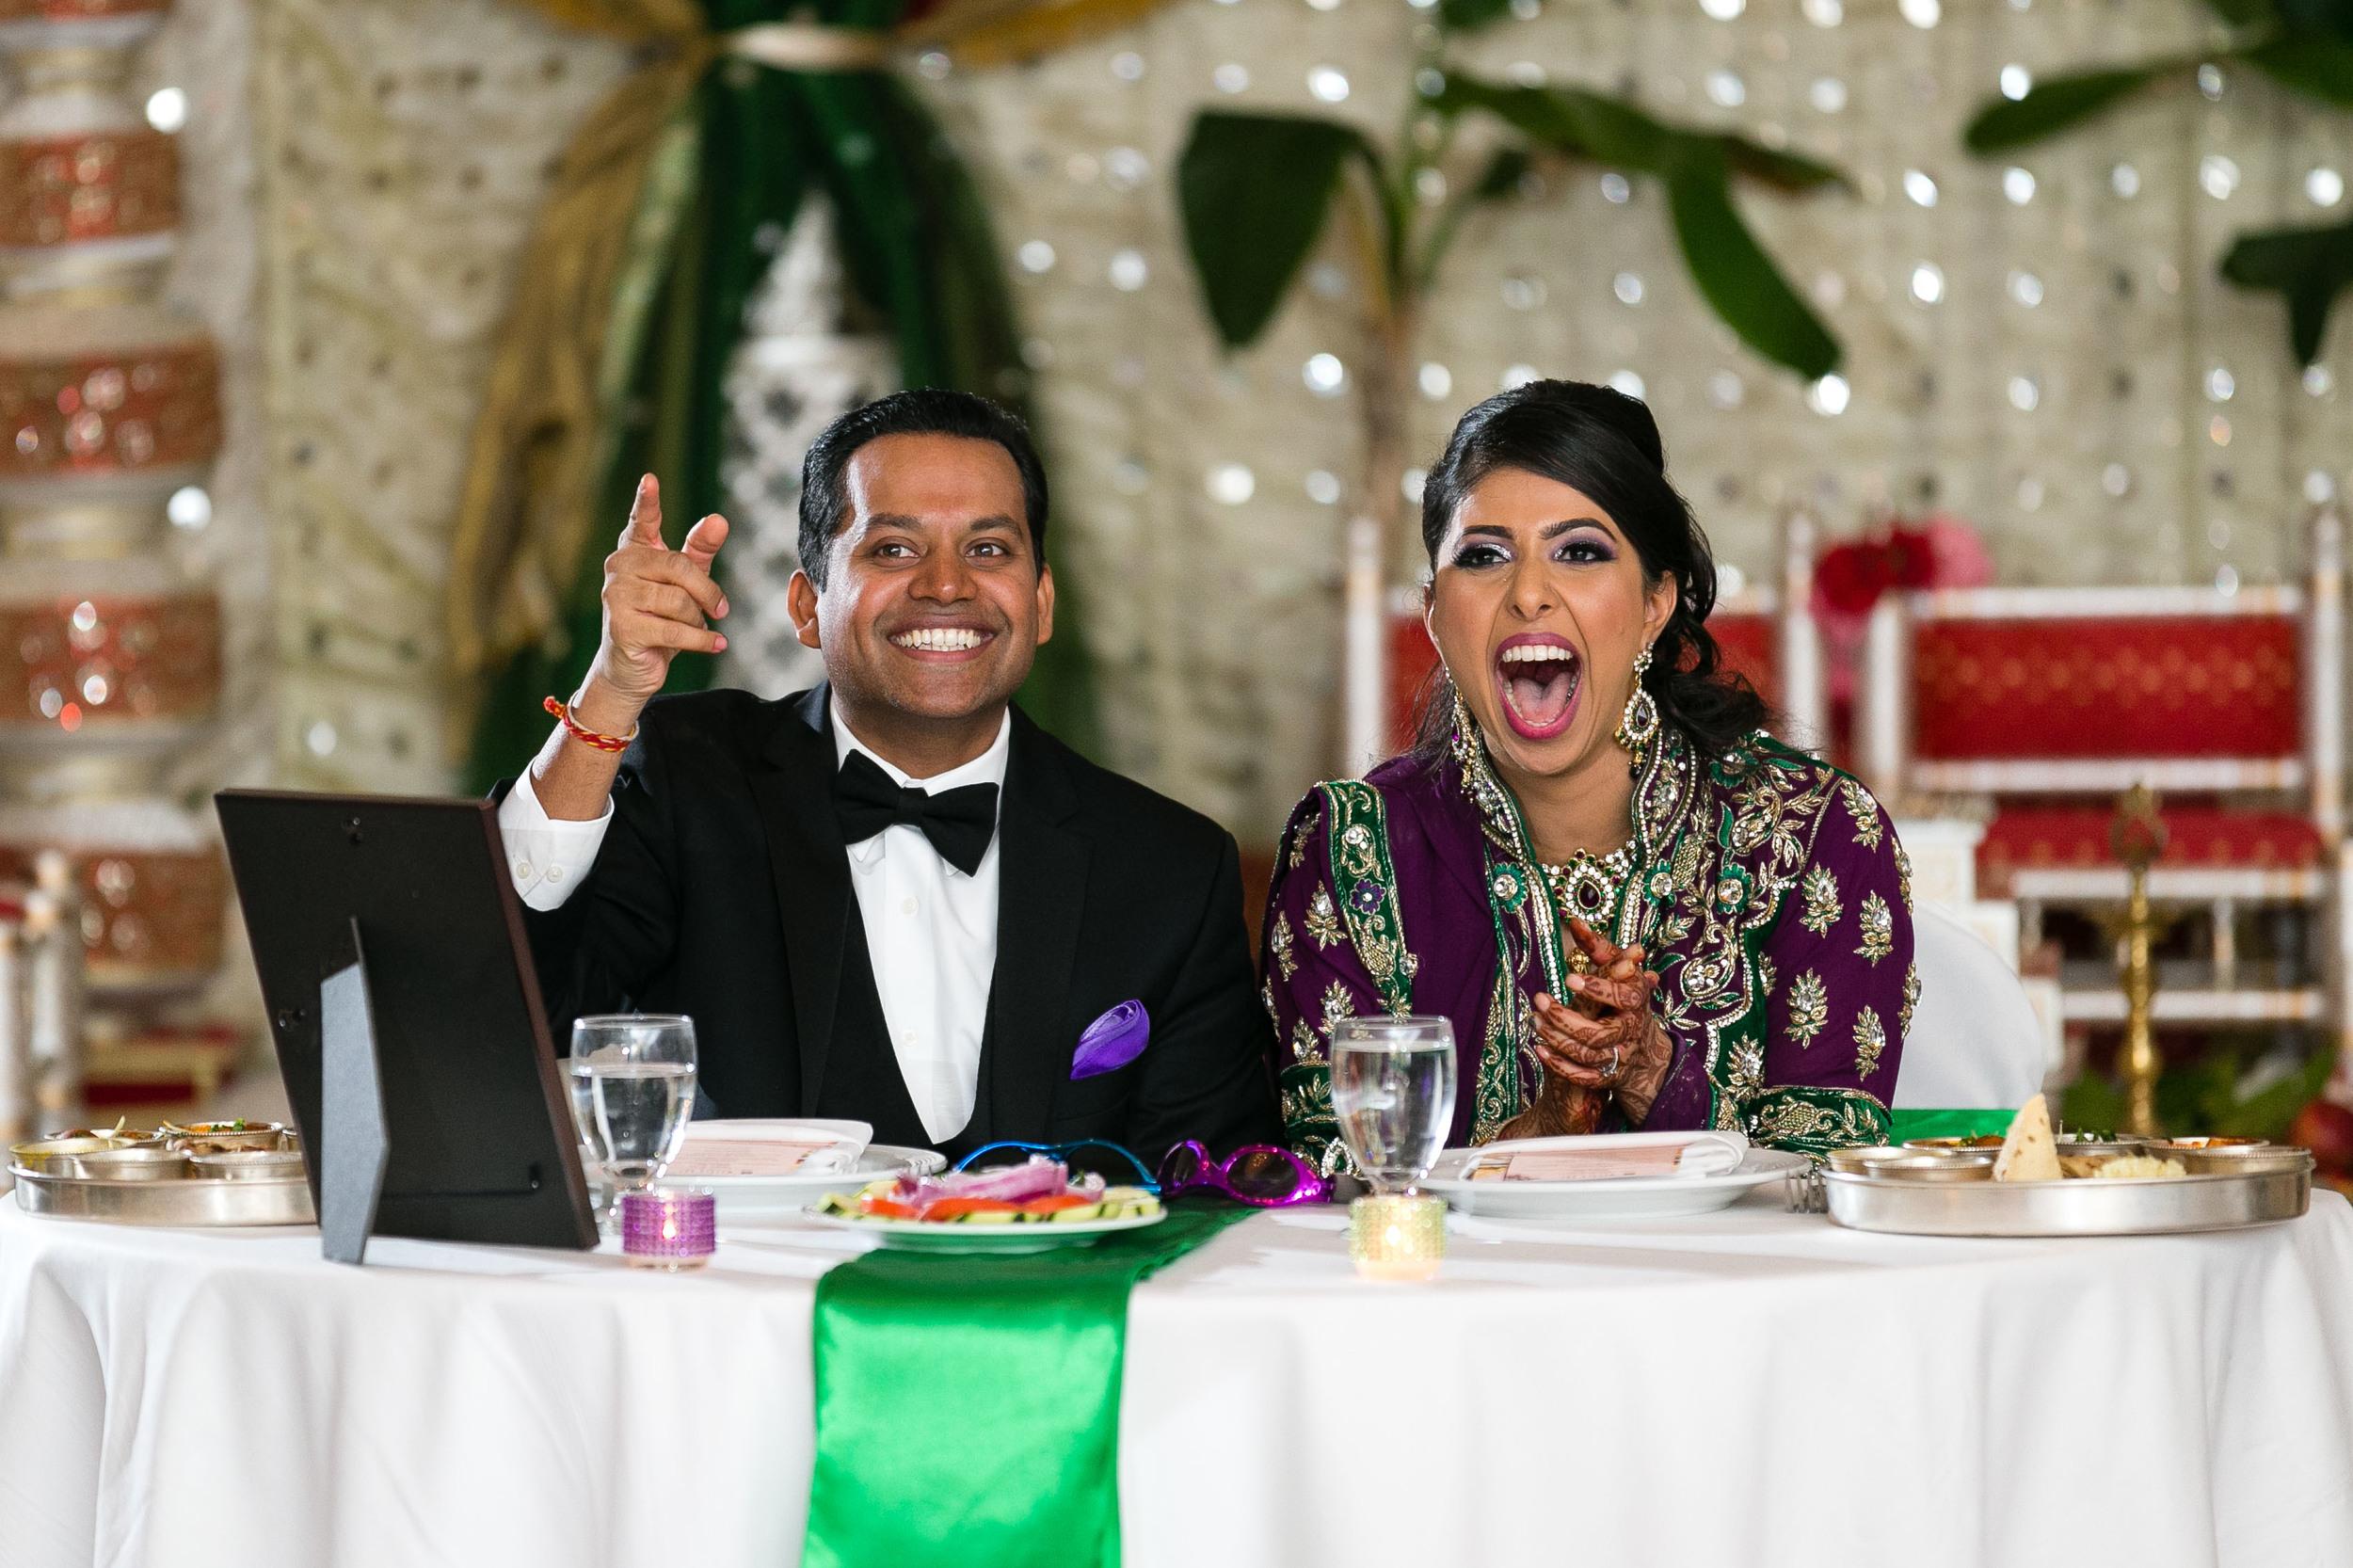 Luxurious-Indian-Wedding-Marriott-Boston-Massachusetts-Documentary-Wedding-Photography-by-Jacek-Dolata-40.jpg